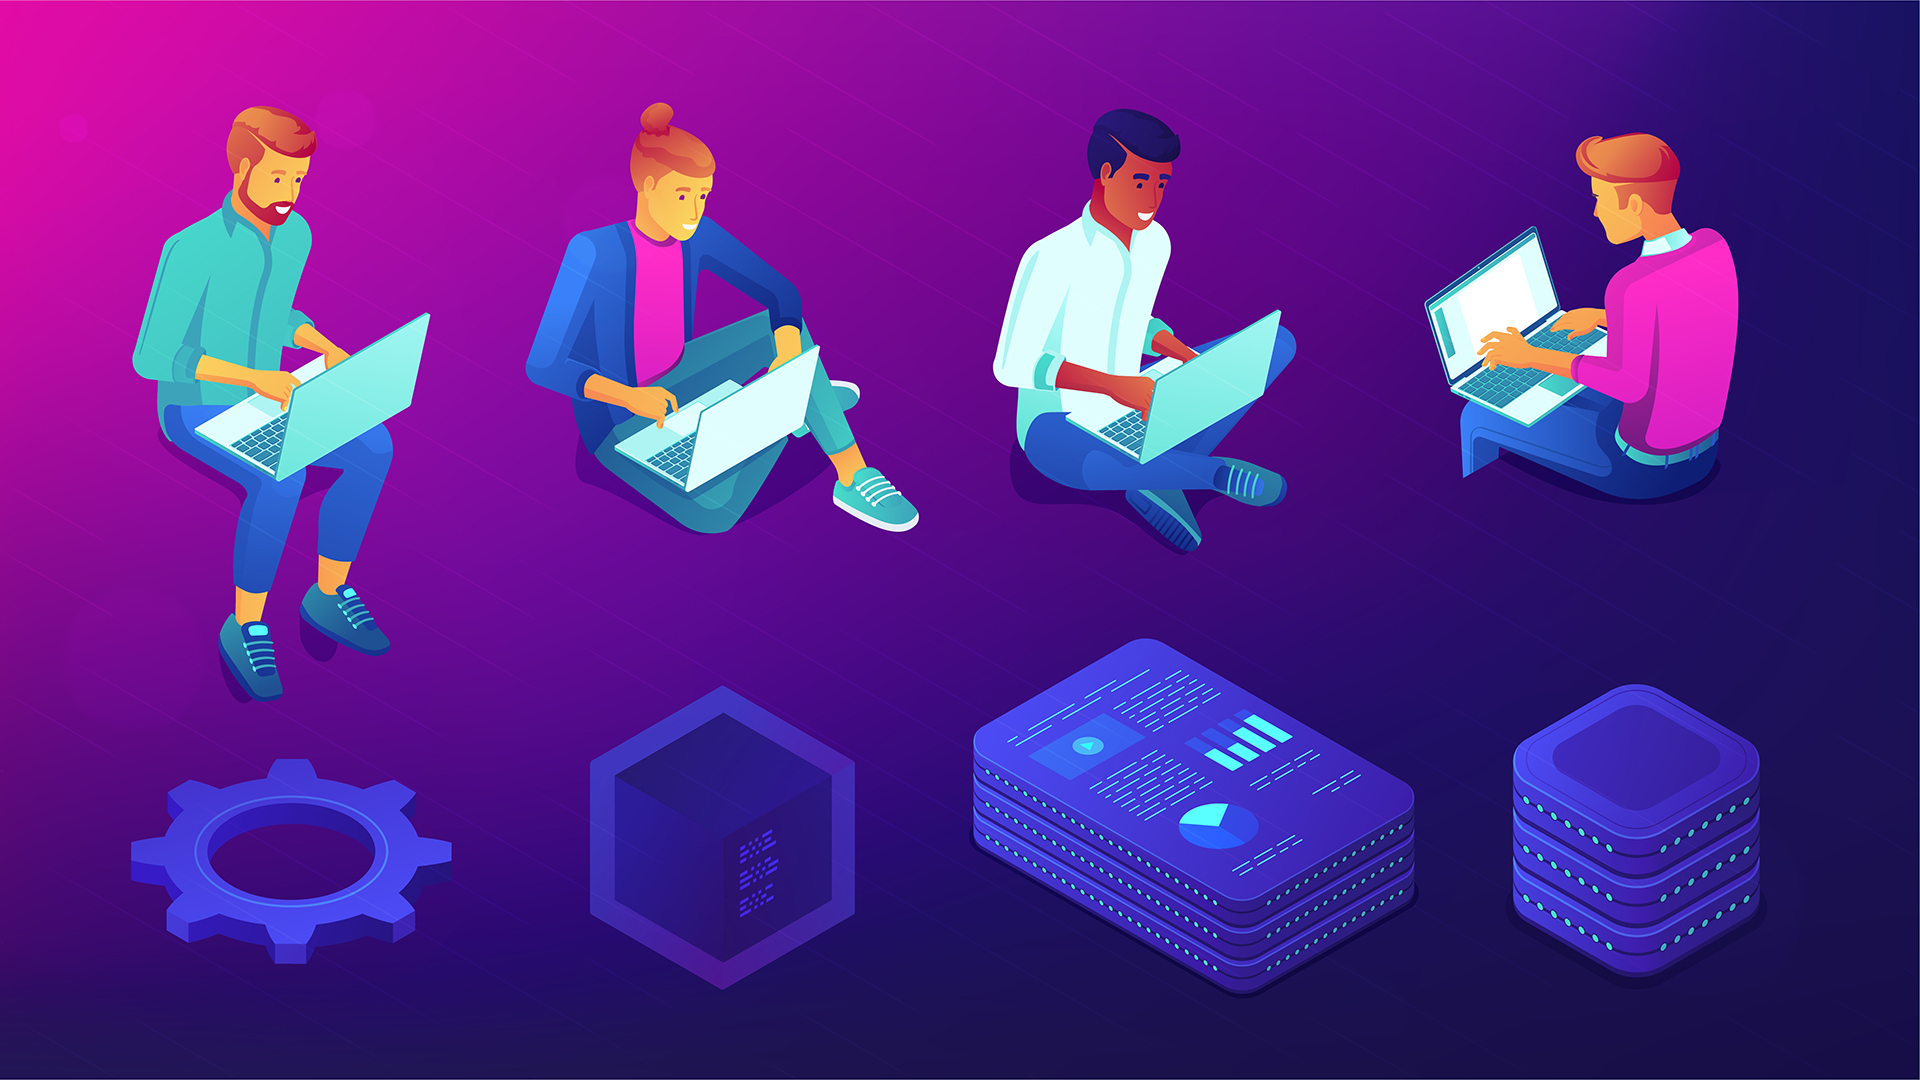 Managing virtual teams of software developers